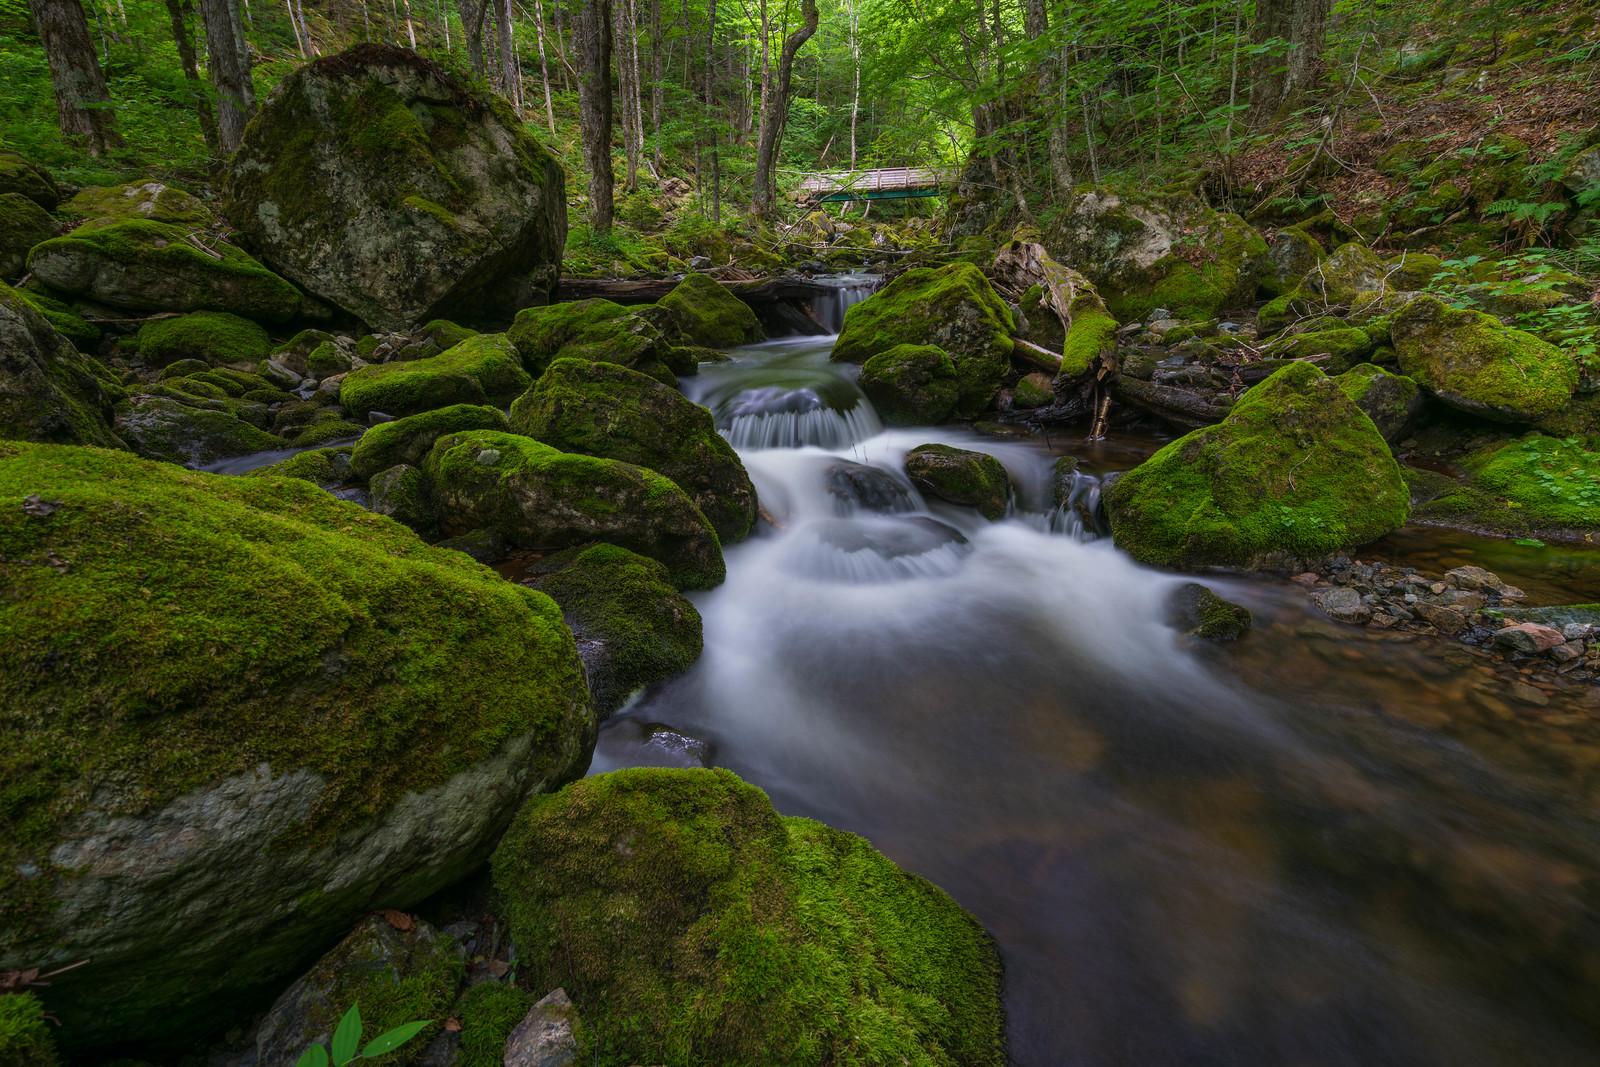 The beautiful green at Uisge Ban Falls Provincial Park in Nova Scotia